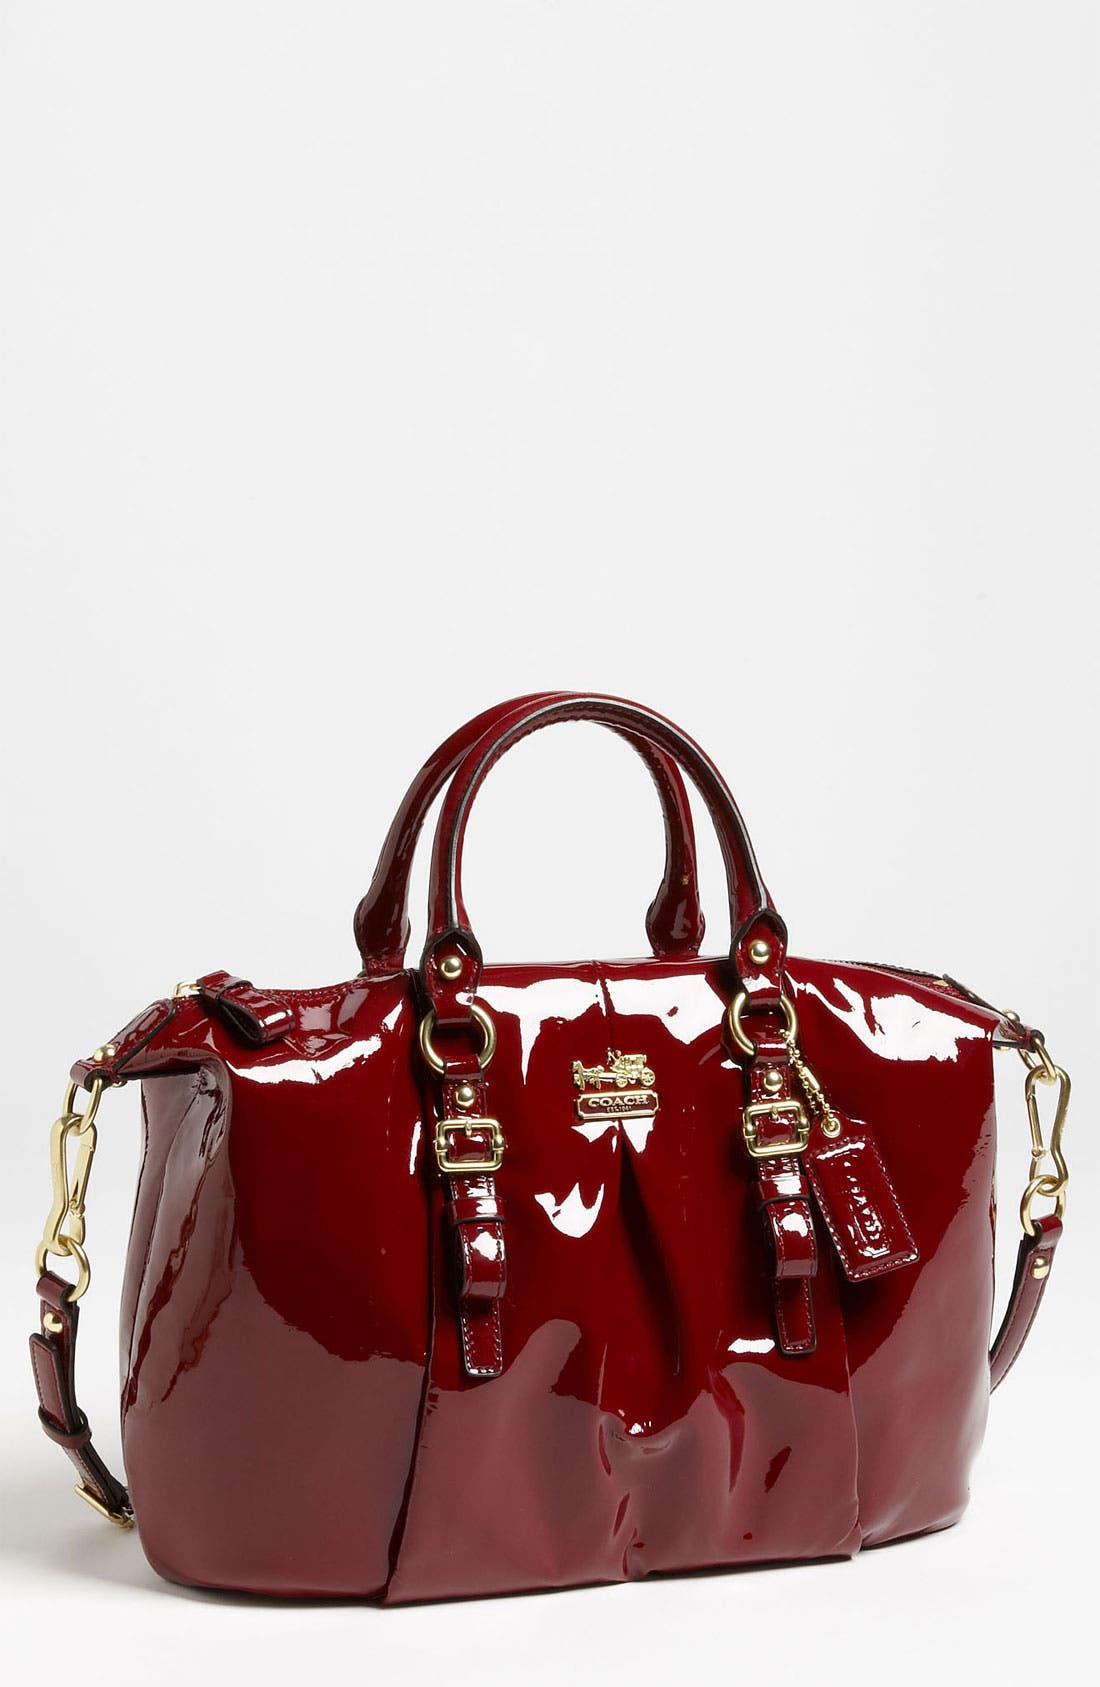 Main Image - COACH 'New Madison - Juliette' Patent Leather Satchel